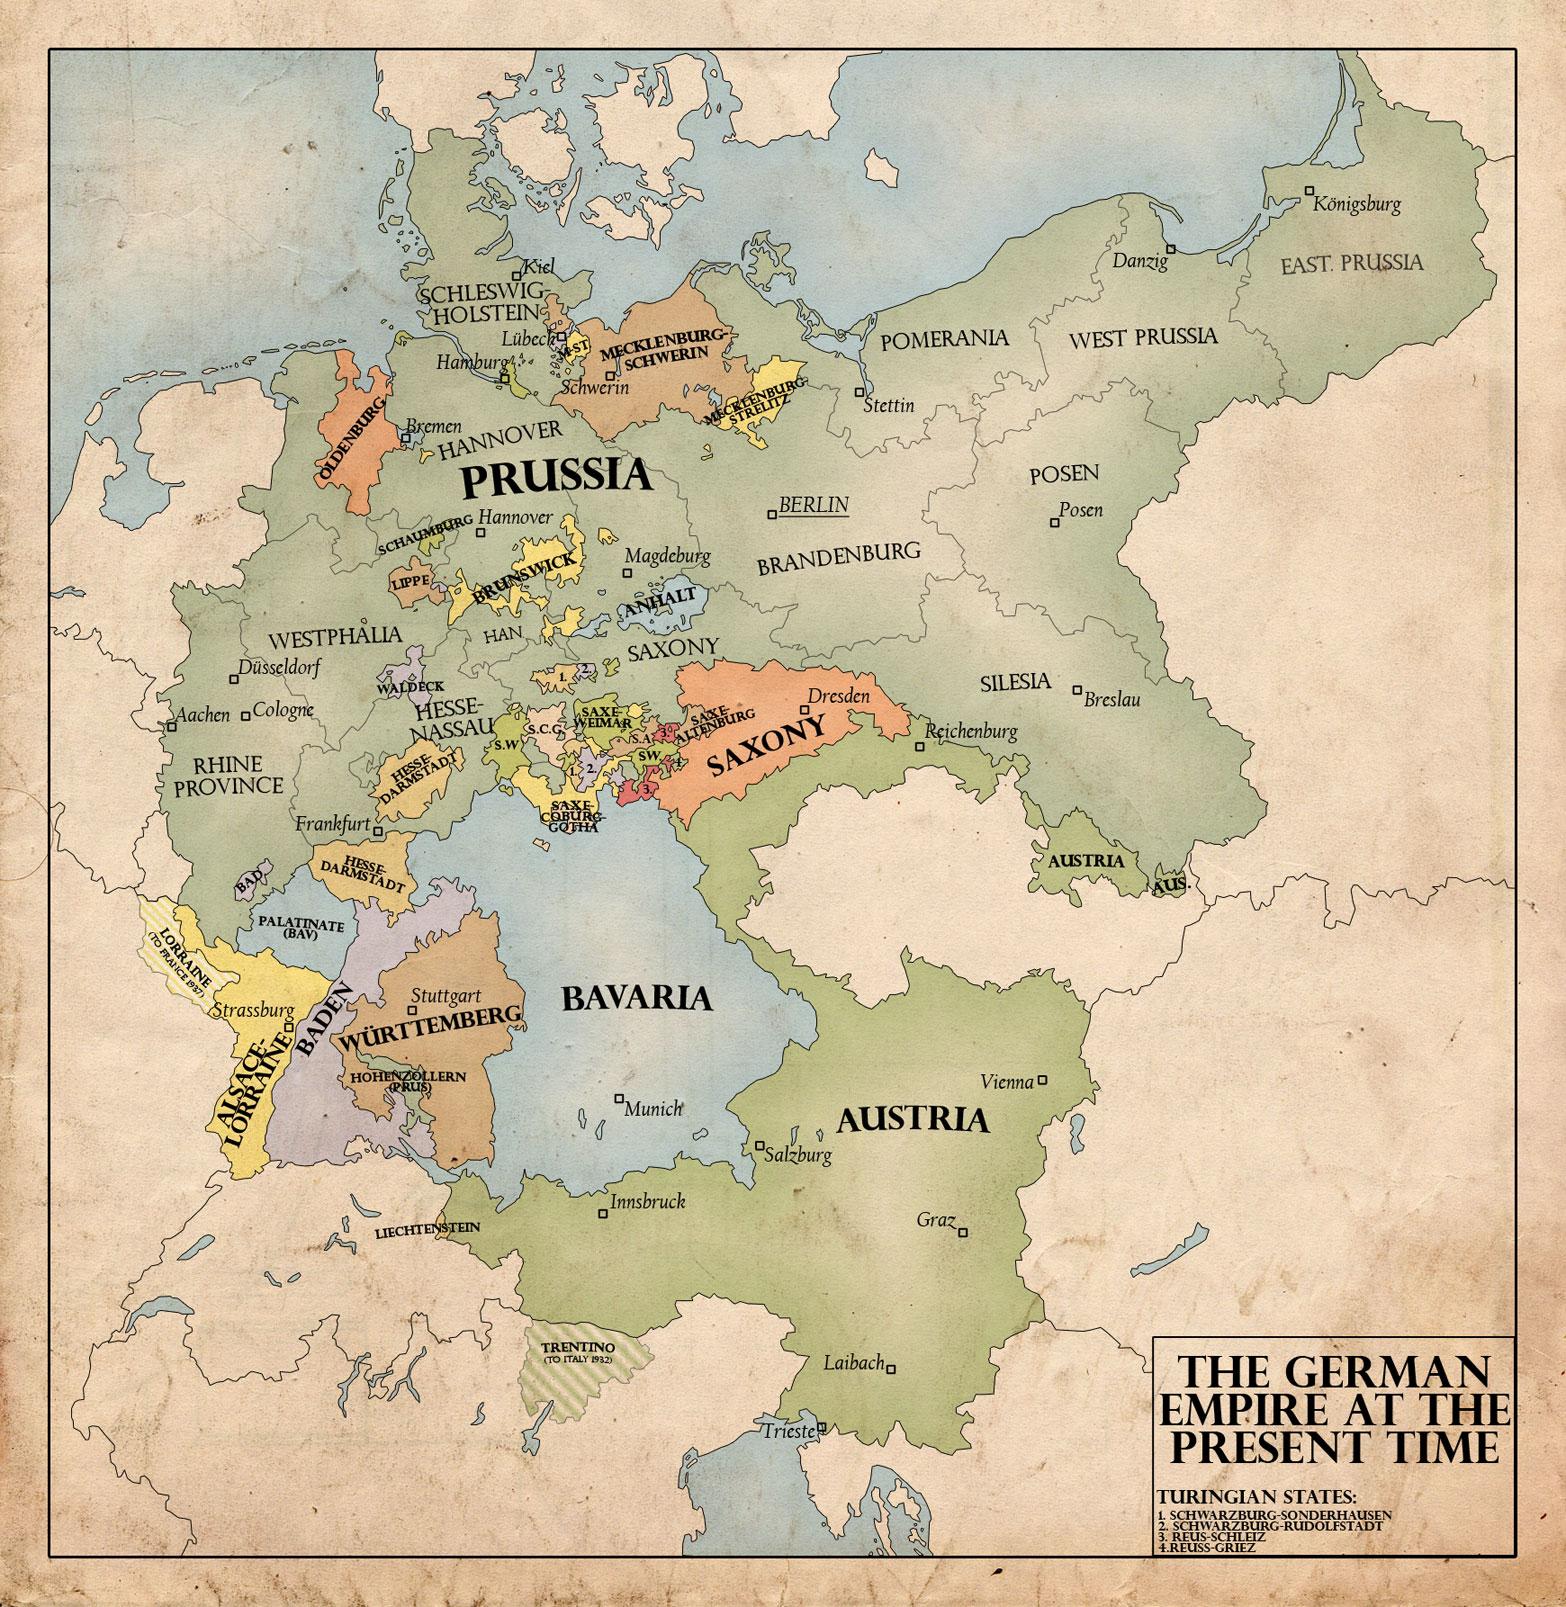 The German Empire, 1940 by edthomasten